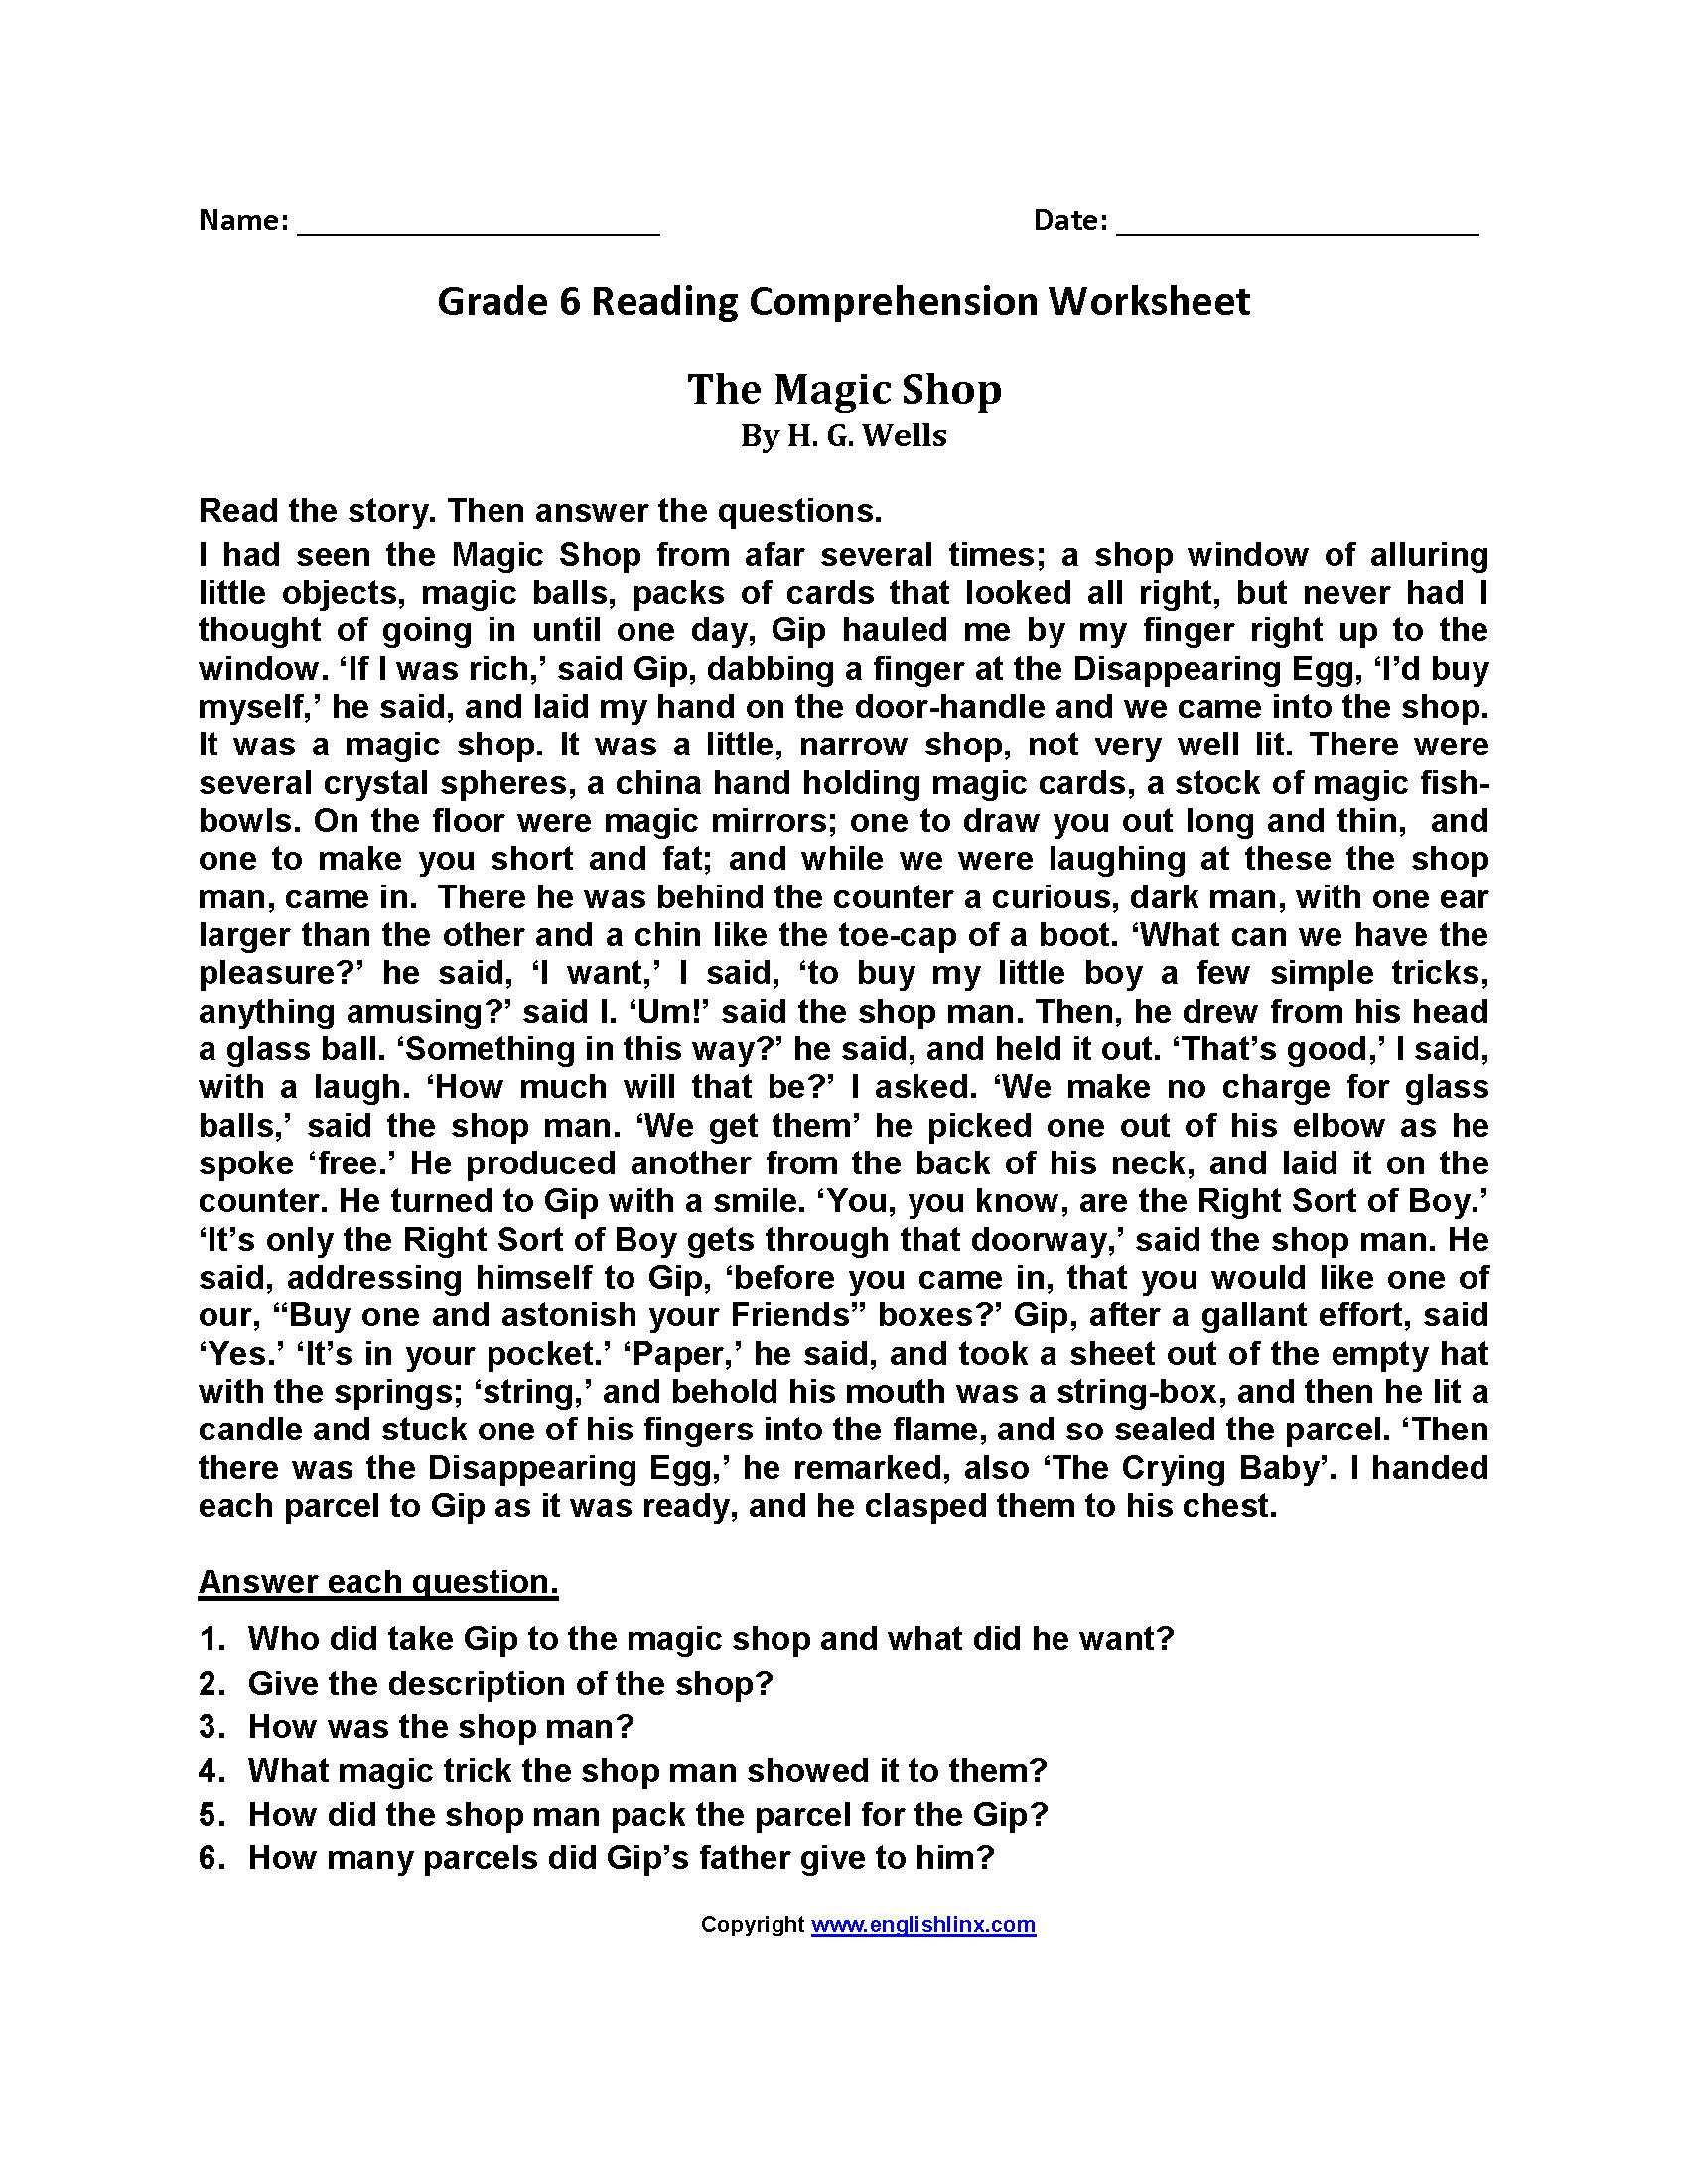 Abraham Lincoln Comprehension Worksheet and Reading Worksheets Sixth Grade Reading Worksheets